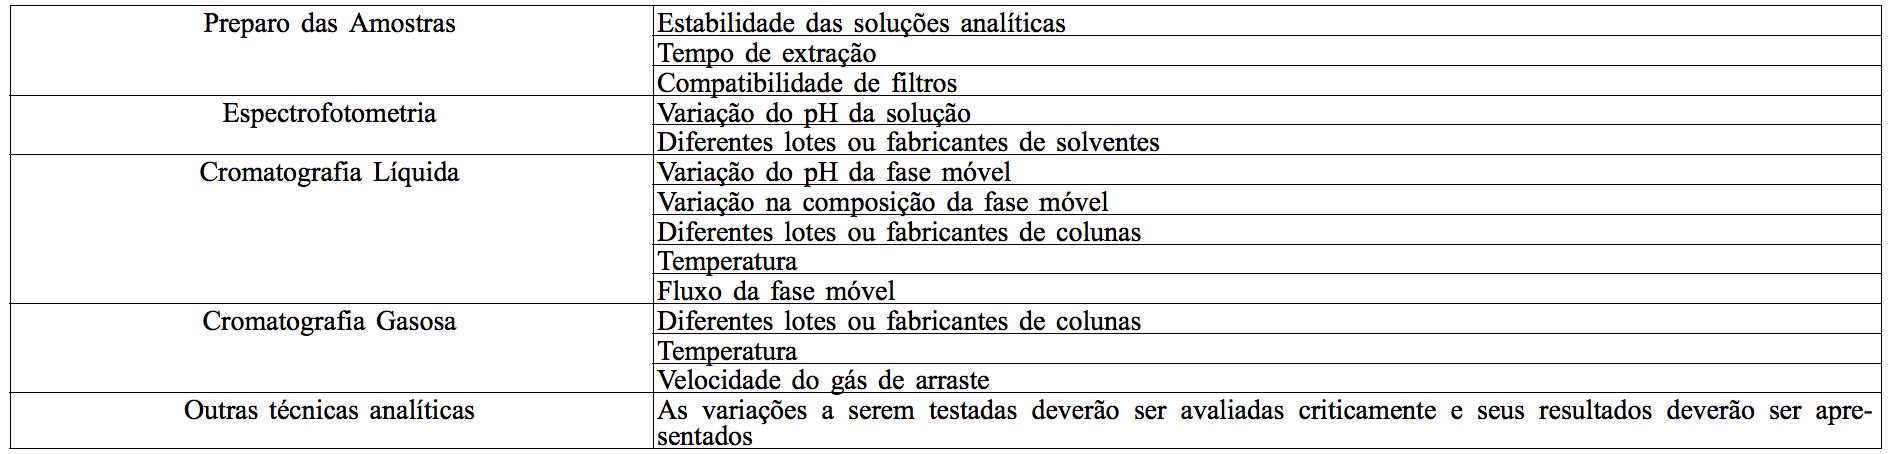 tabela 1 rdc 166/17